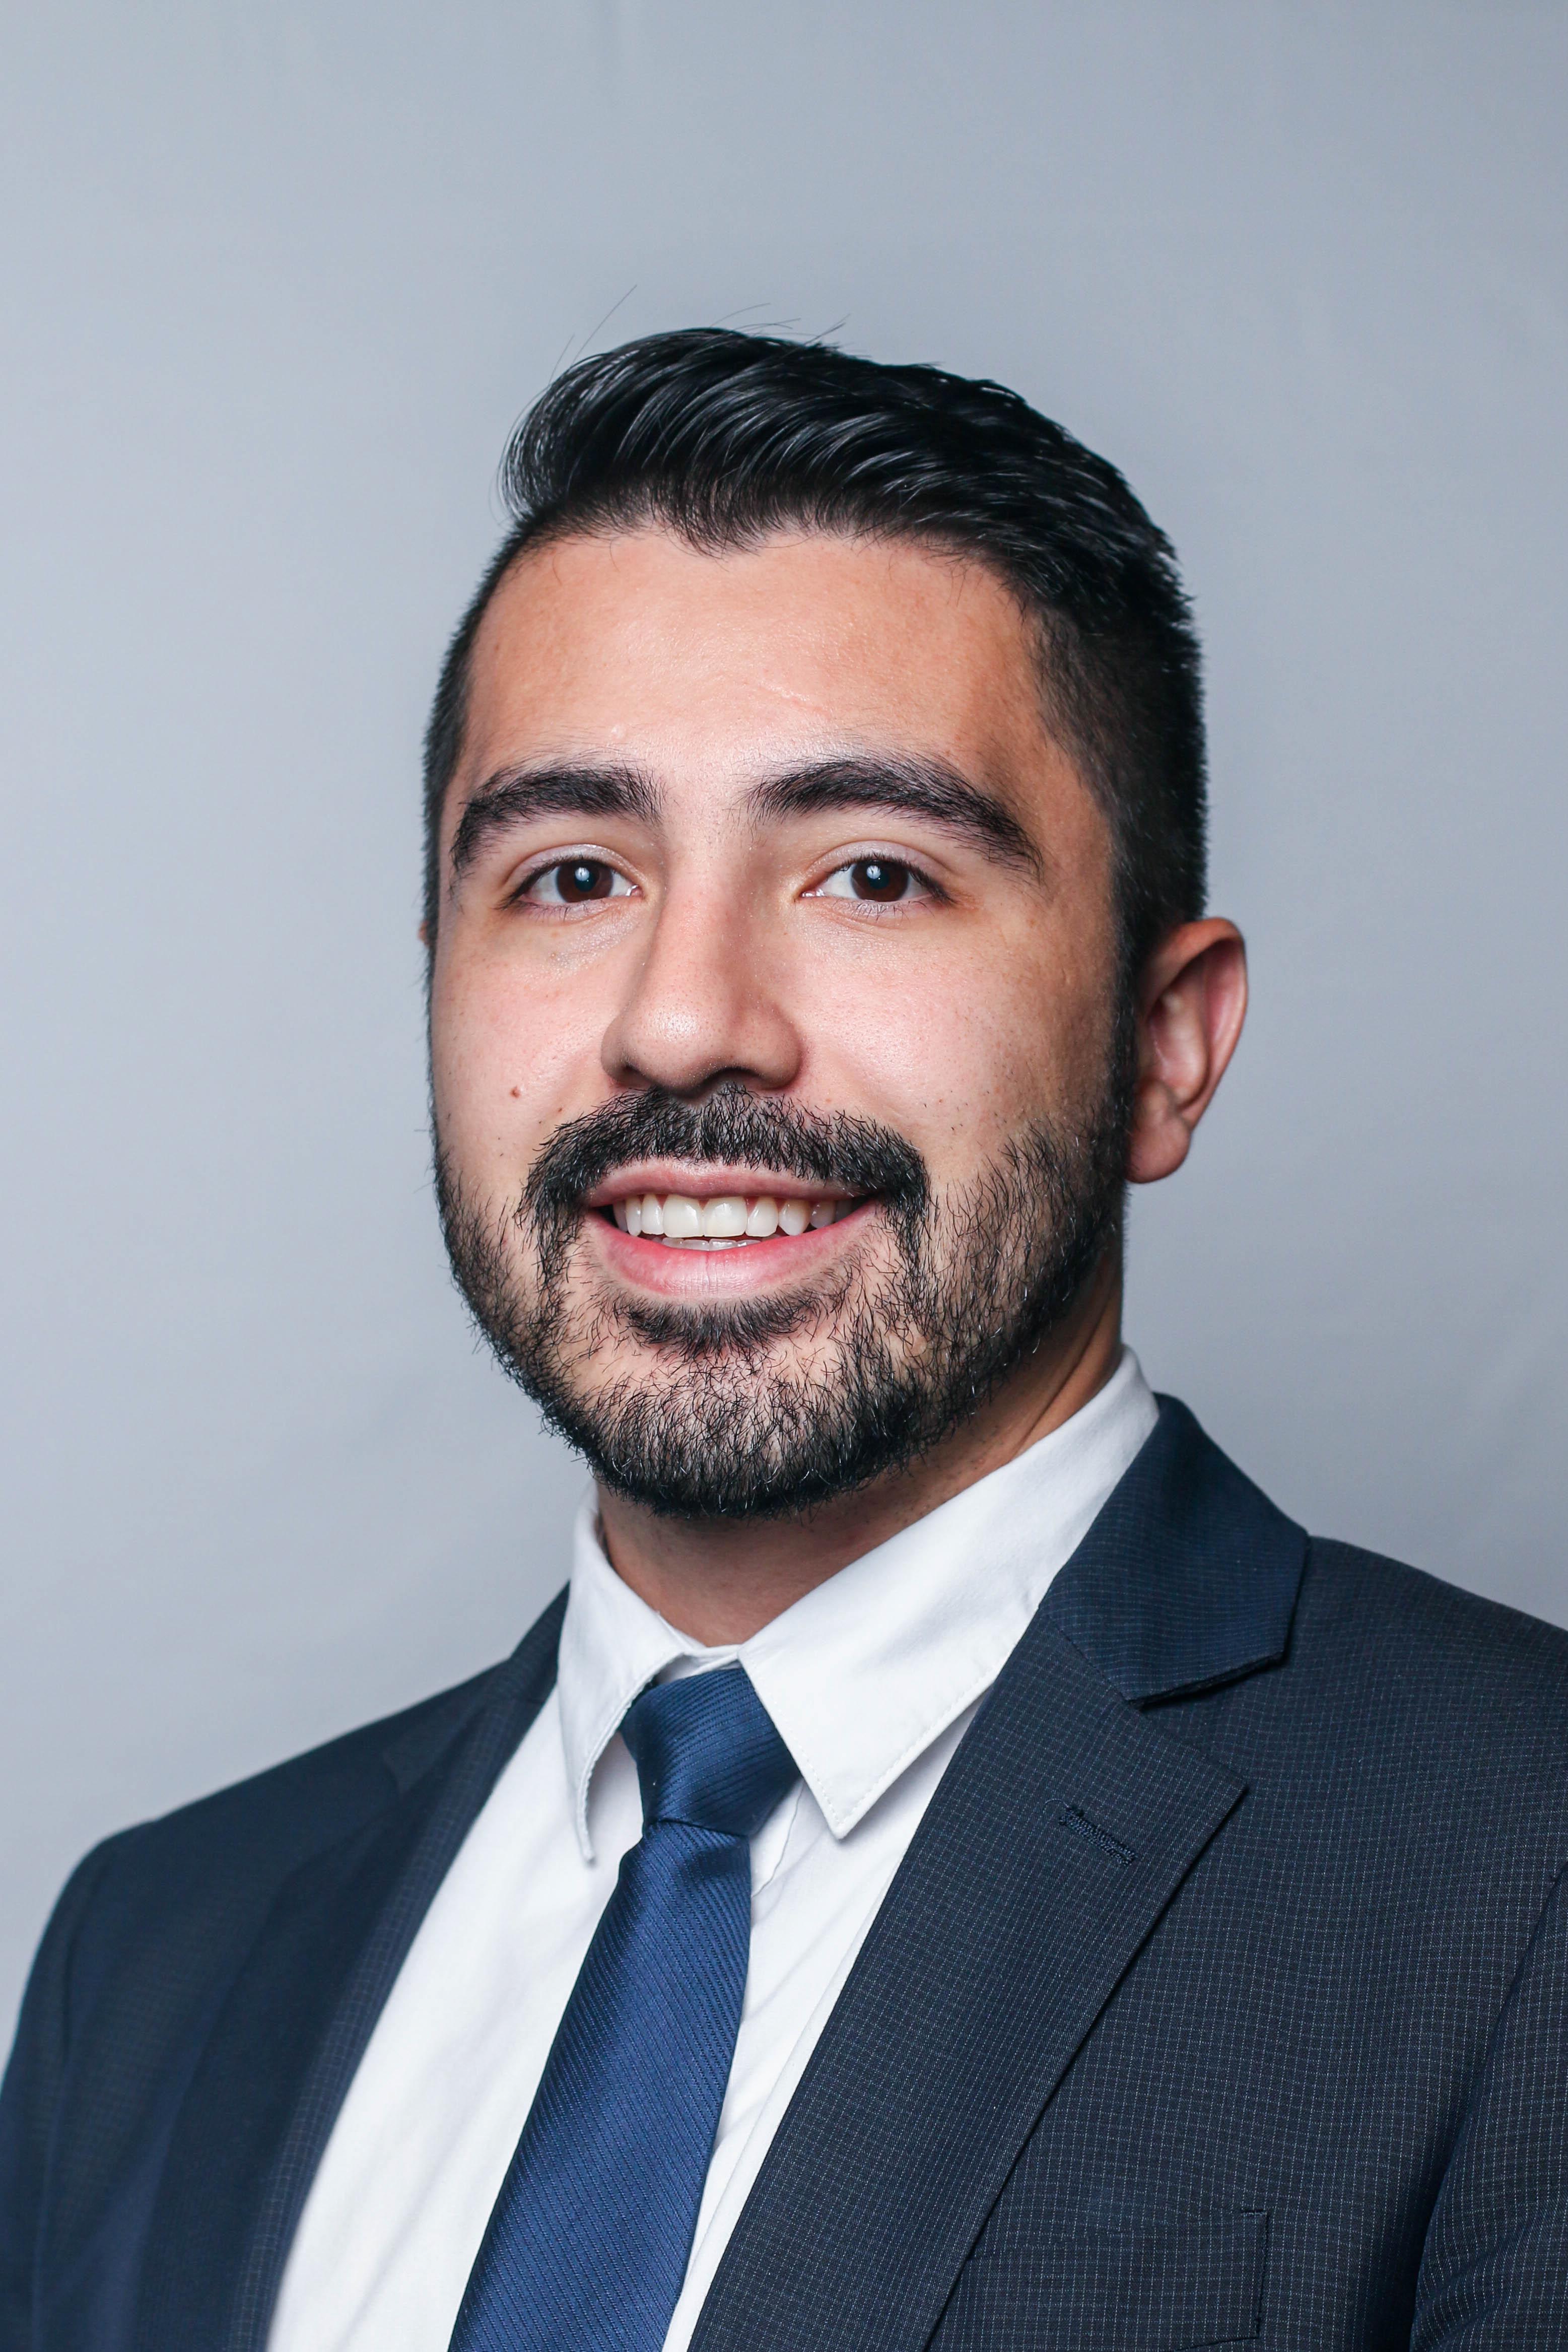 Mauricio Cortes Resendiz